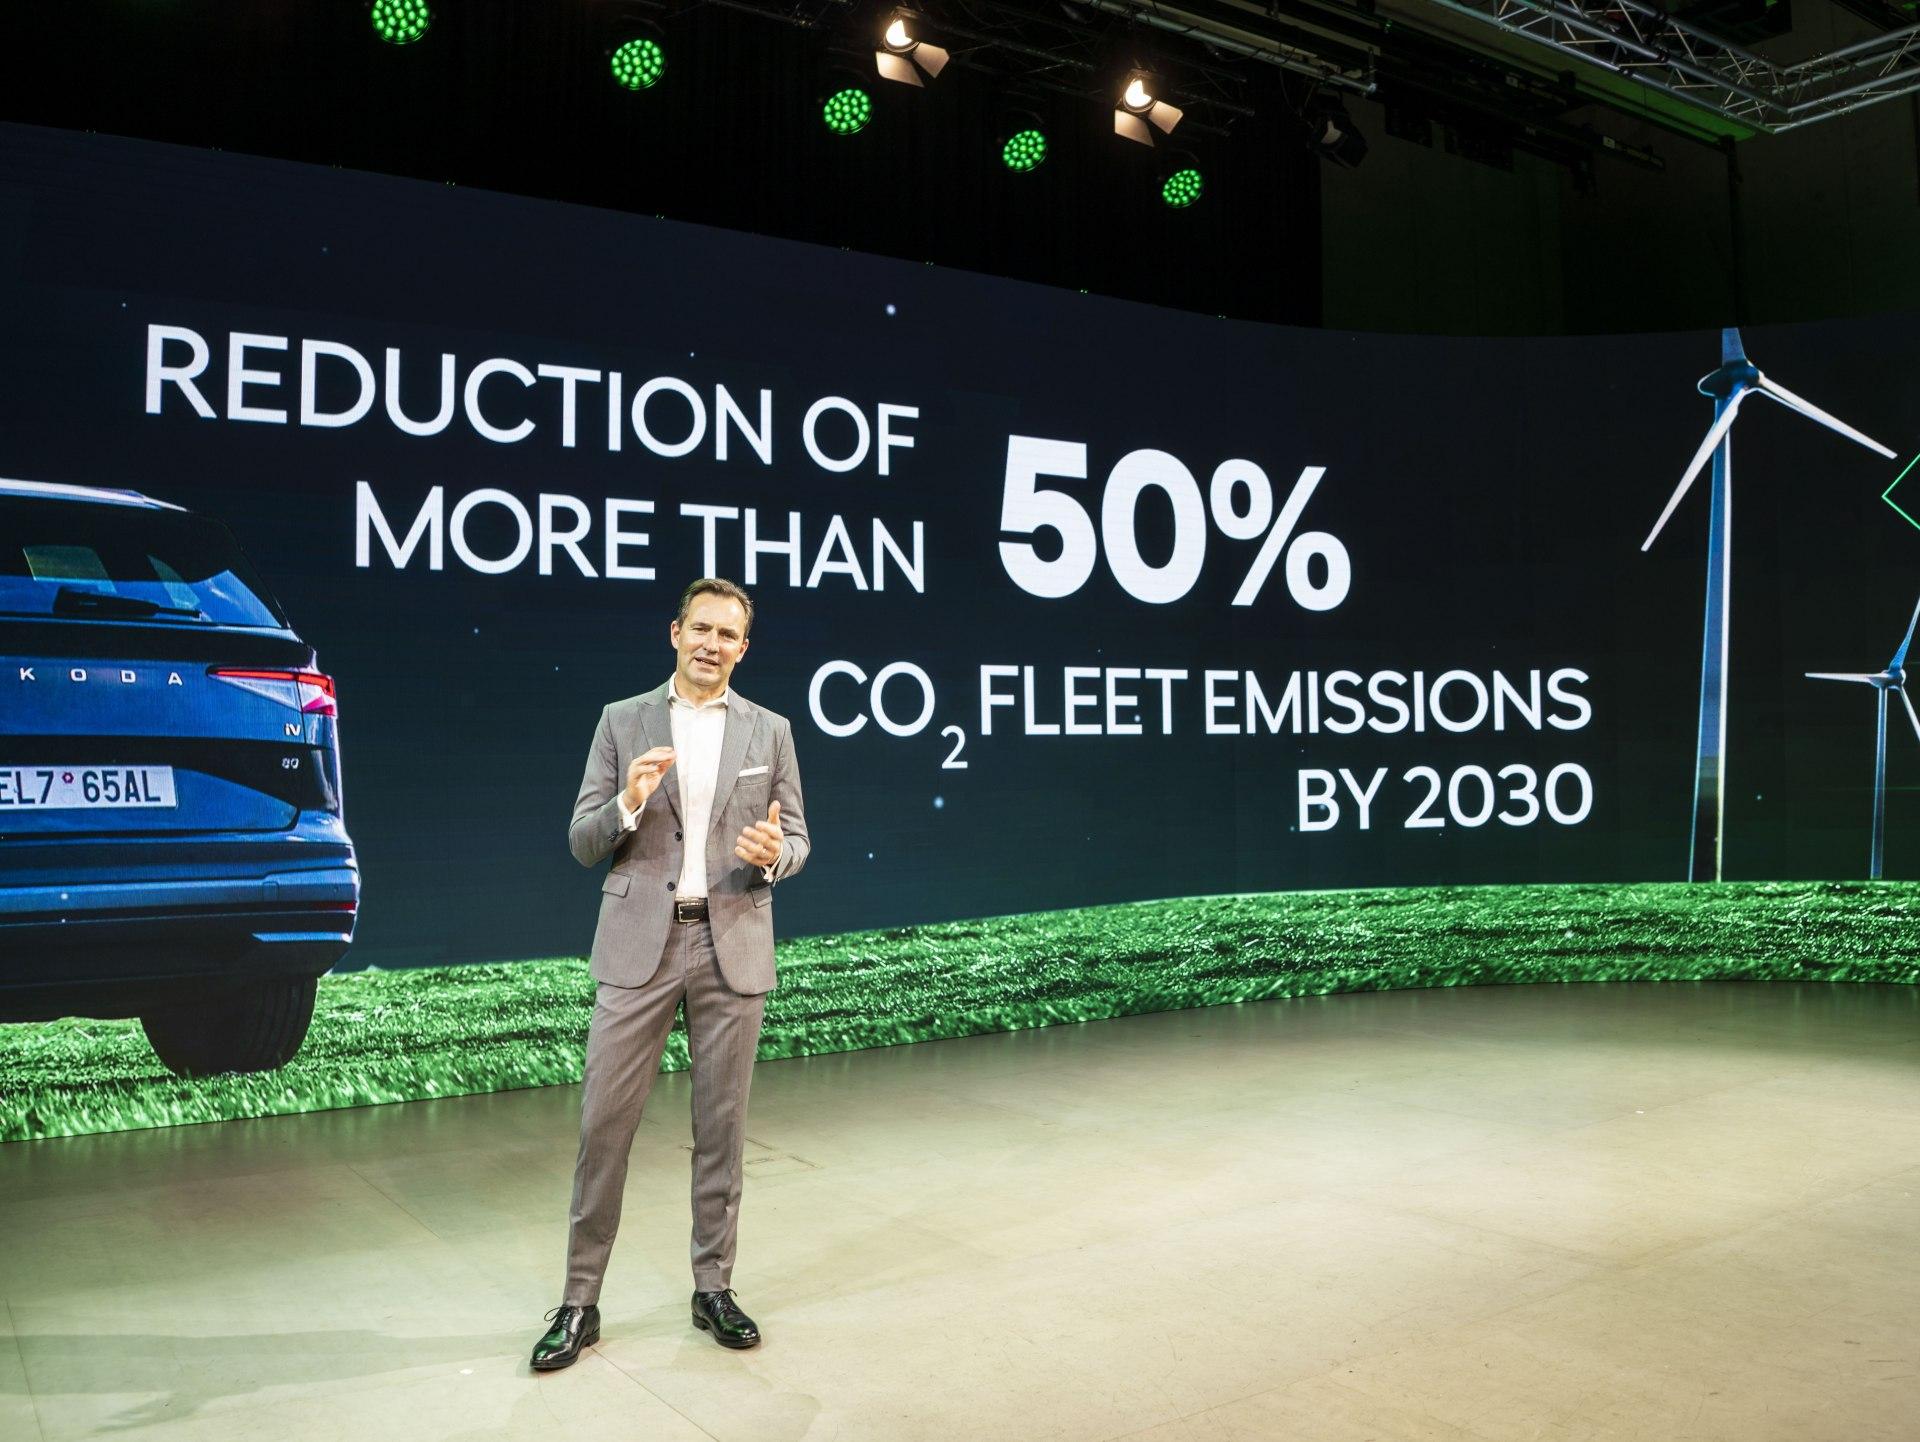 SKODA AUTO NEXT LEVEL SKODA STRATEGY 2030 THOMAS SCHAEFER CEO 1 Πώς θα είναι η Skoda το 2030 Skoda, ειδήσεις, Νέα